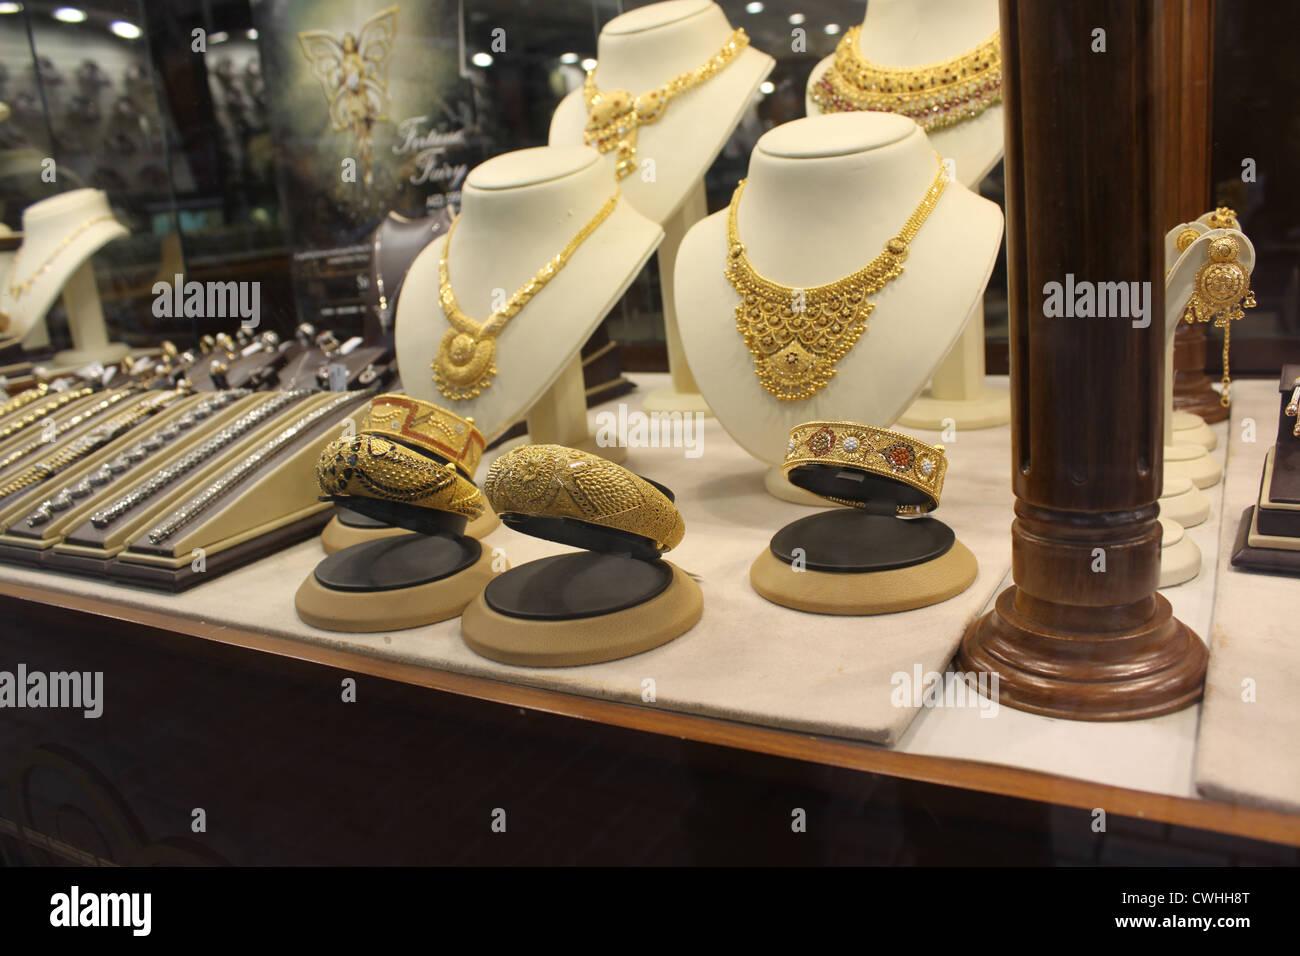 Emirates. Dubai. Gold jewelery in a shop window - Stock Image